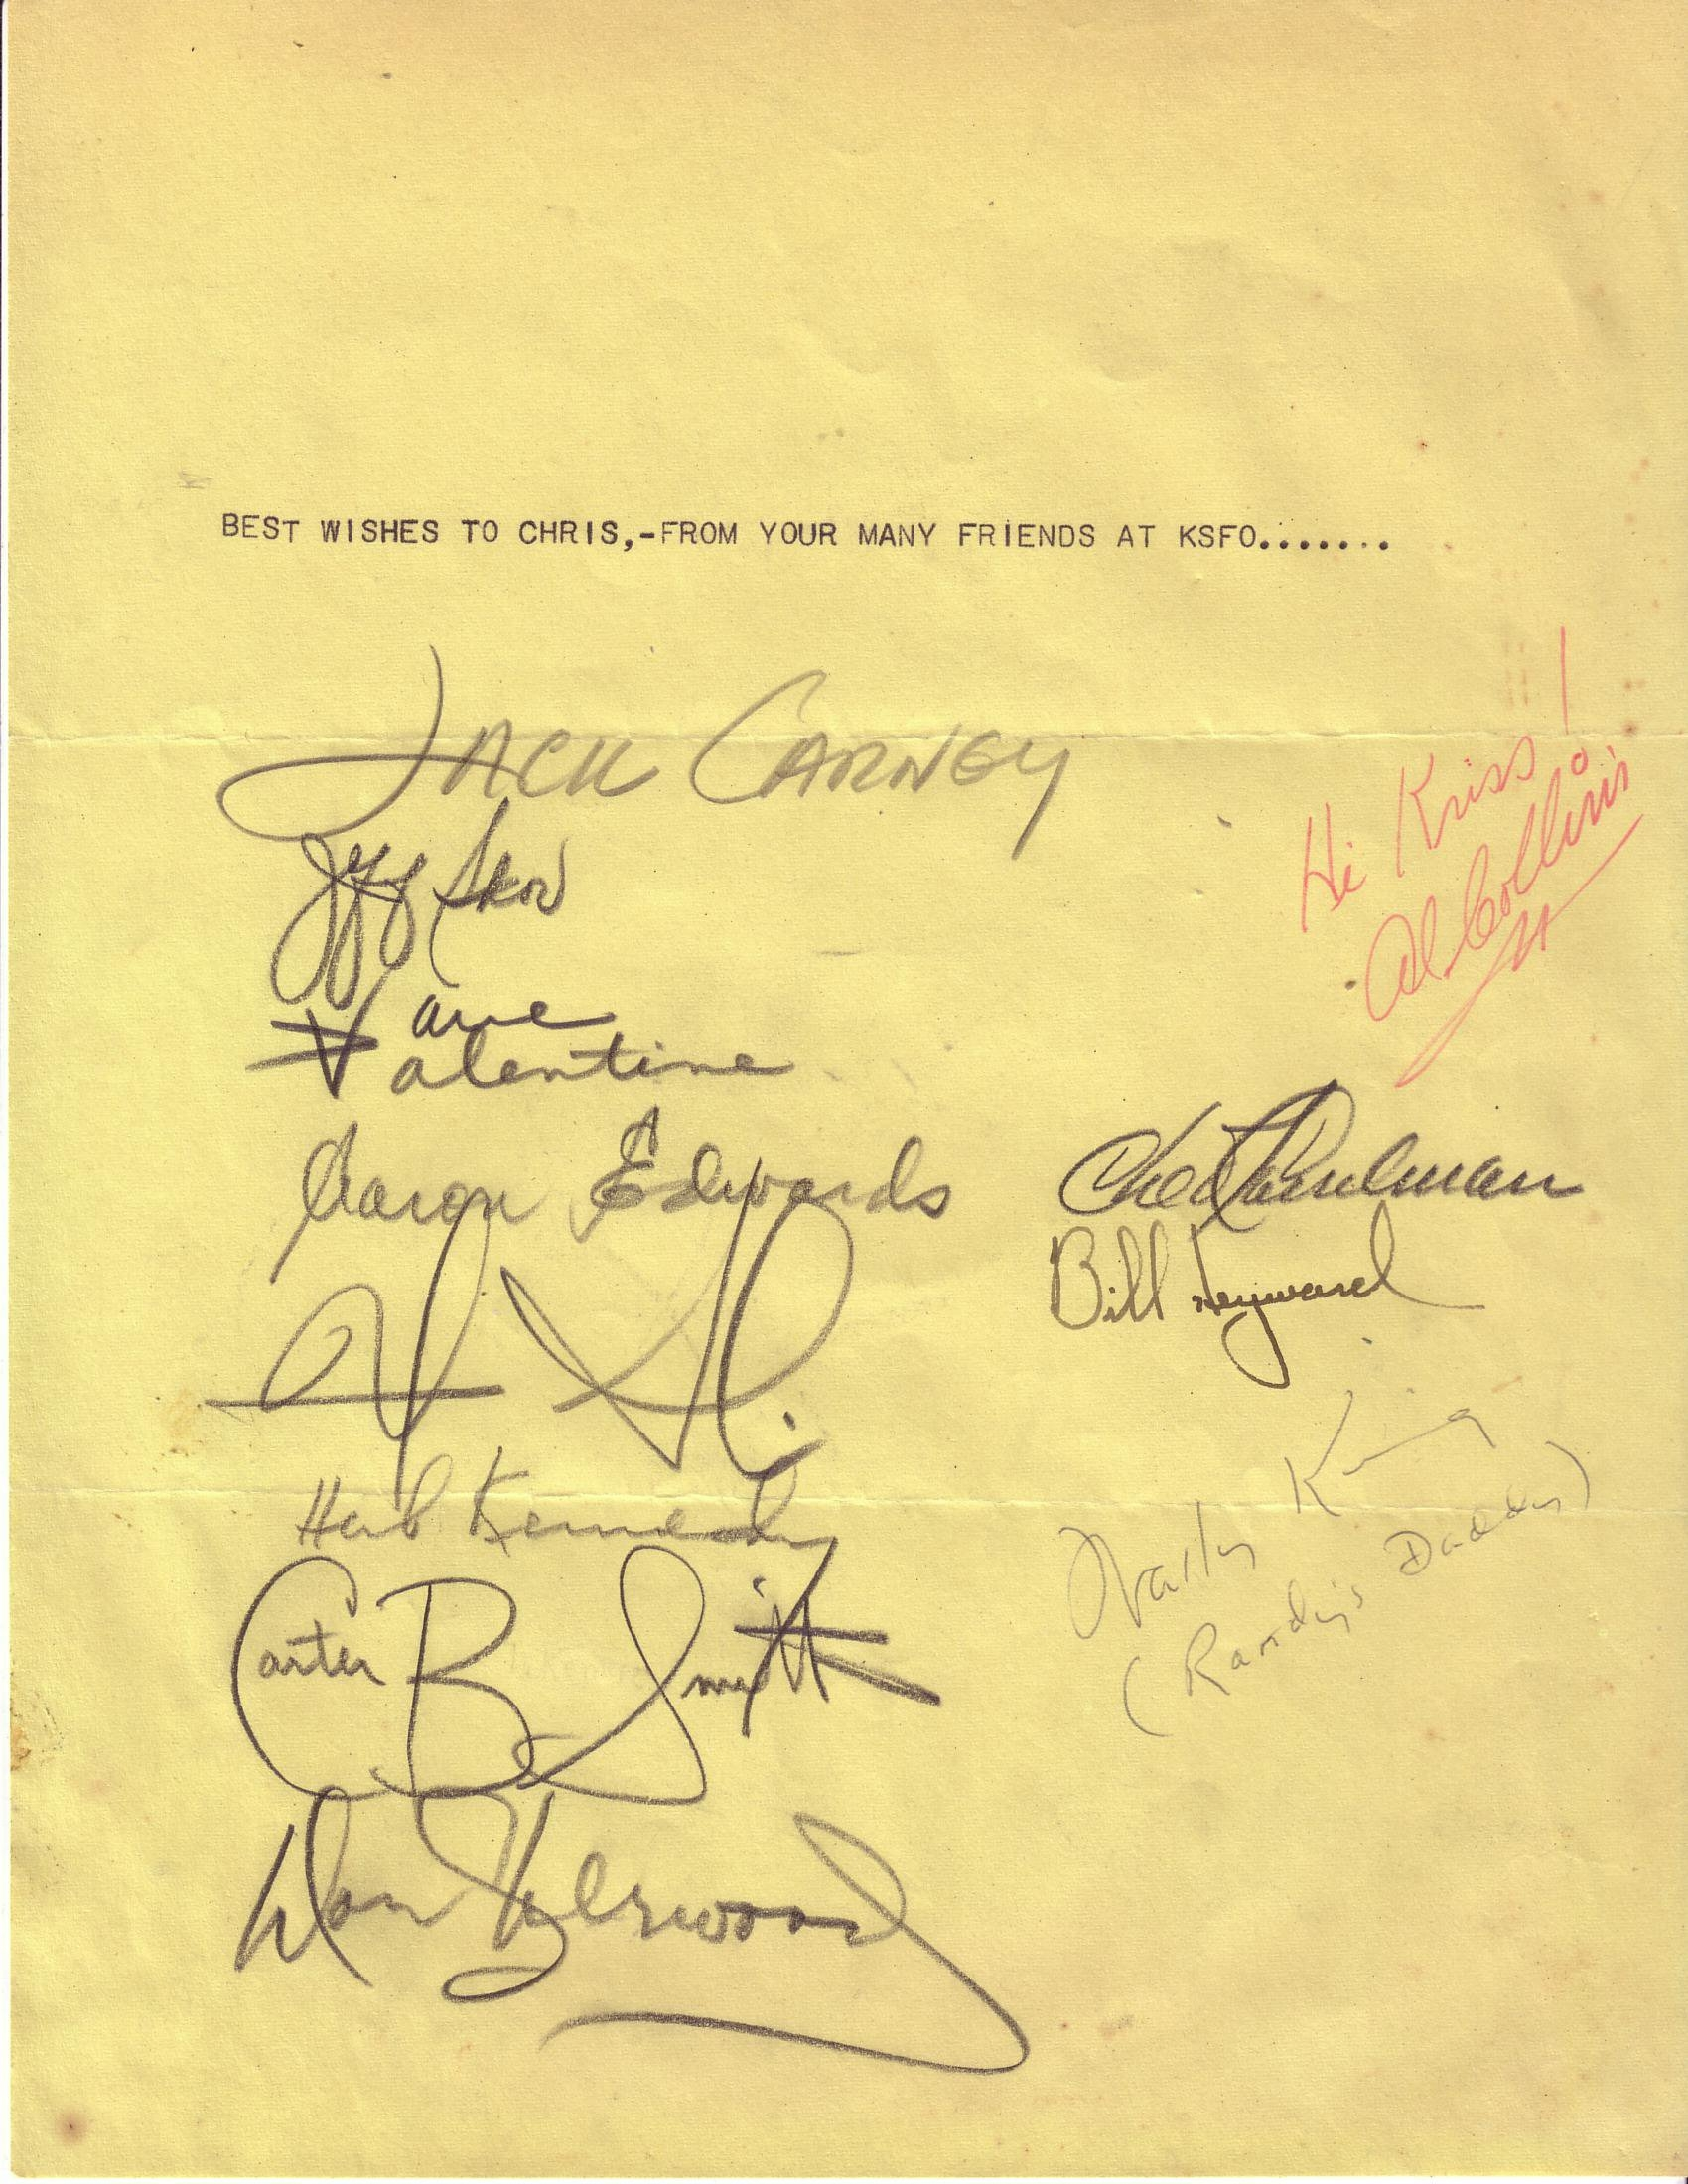 ksfo_autographs_1966